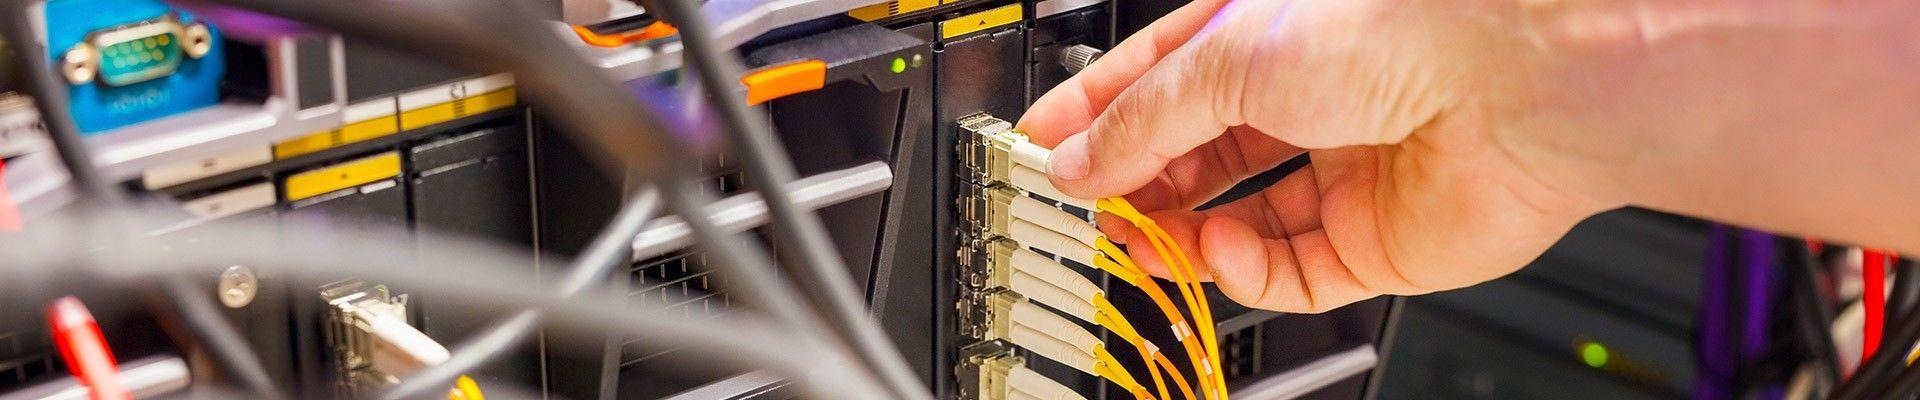 soporte tecnico centro de datos